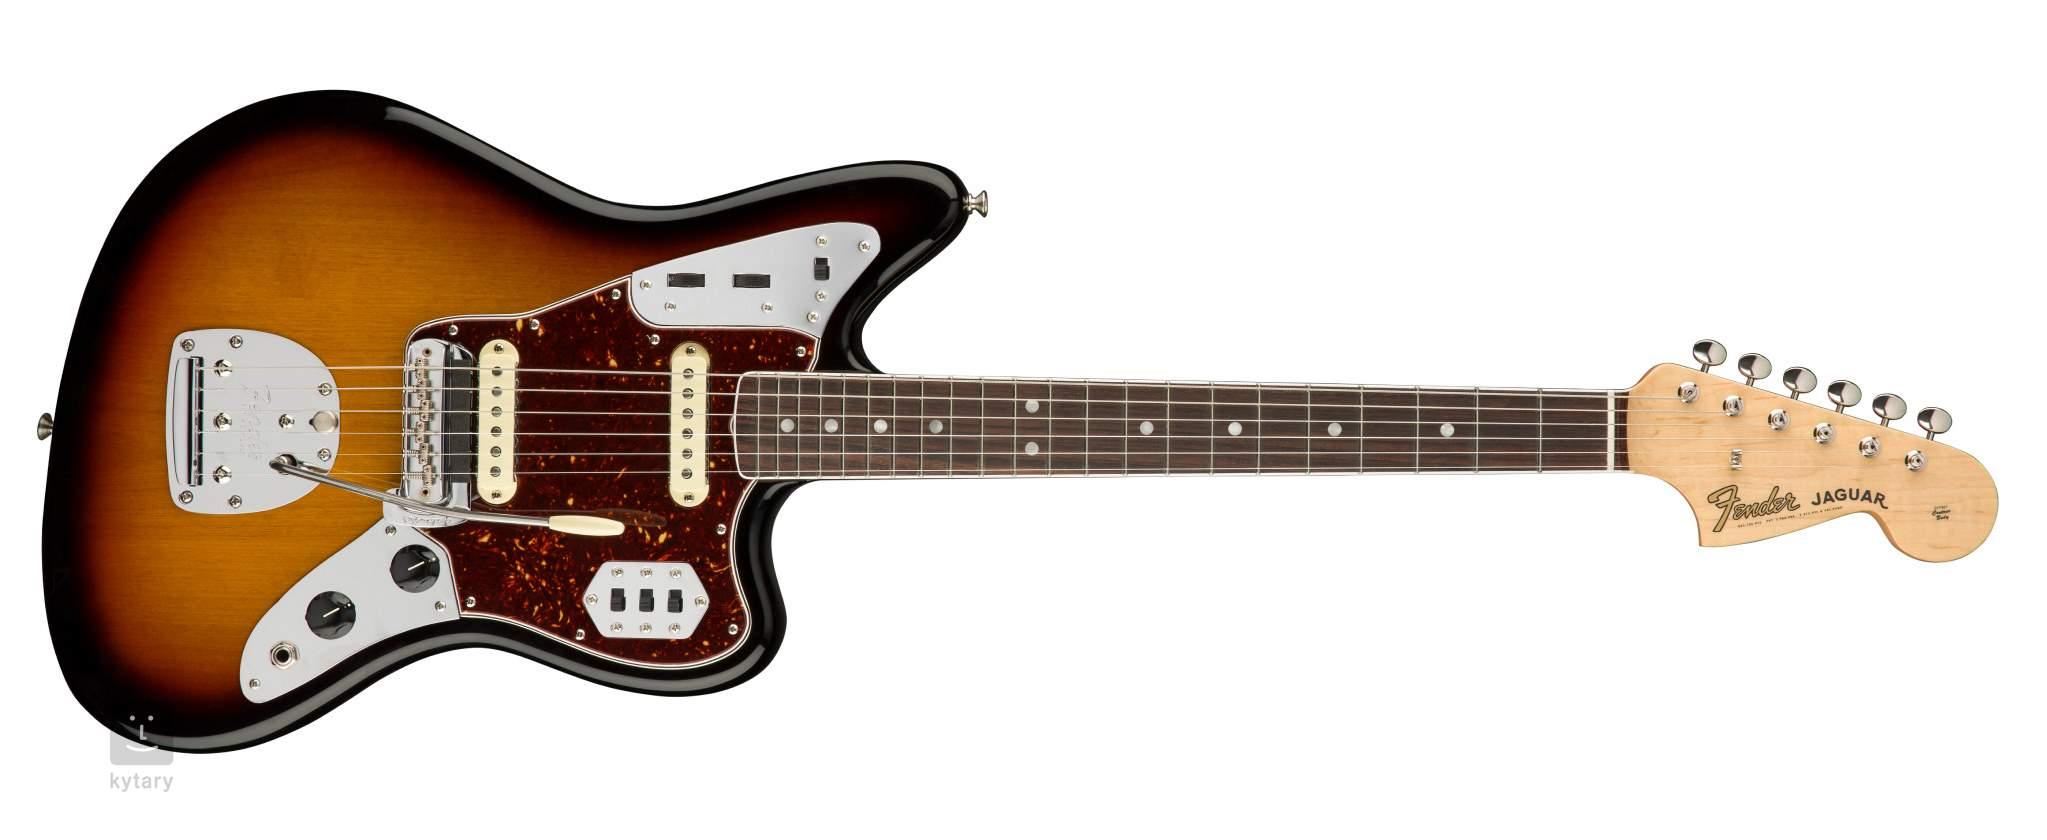 fender american original 60s jaguar rw 3tsb electric guitar. Black Bedroom Furniture Sets. Home Design Ideas